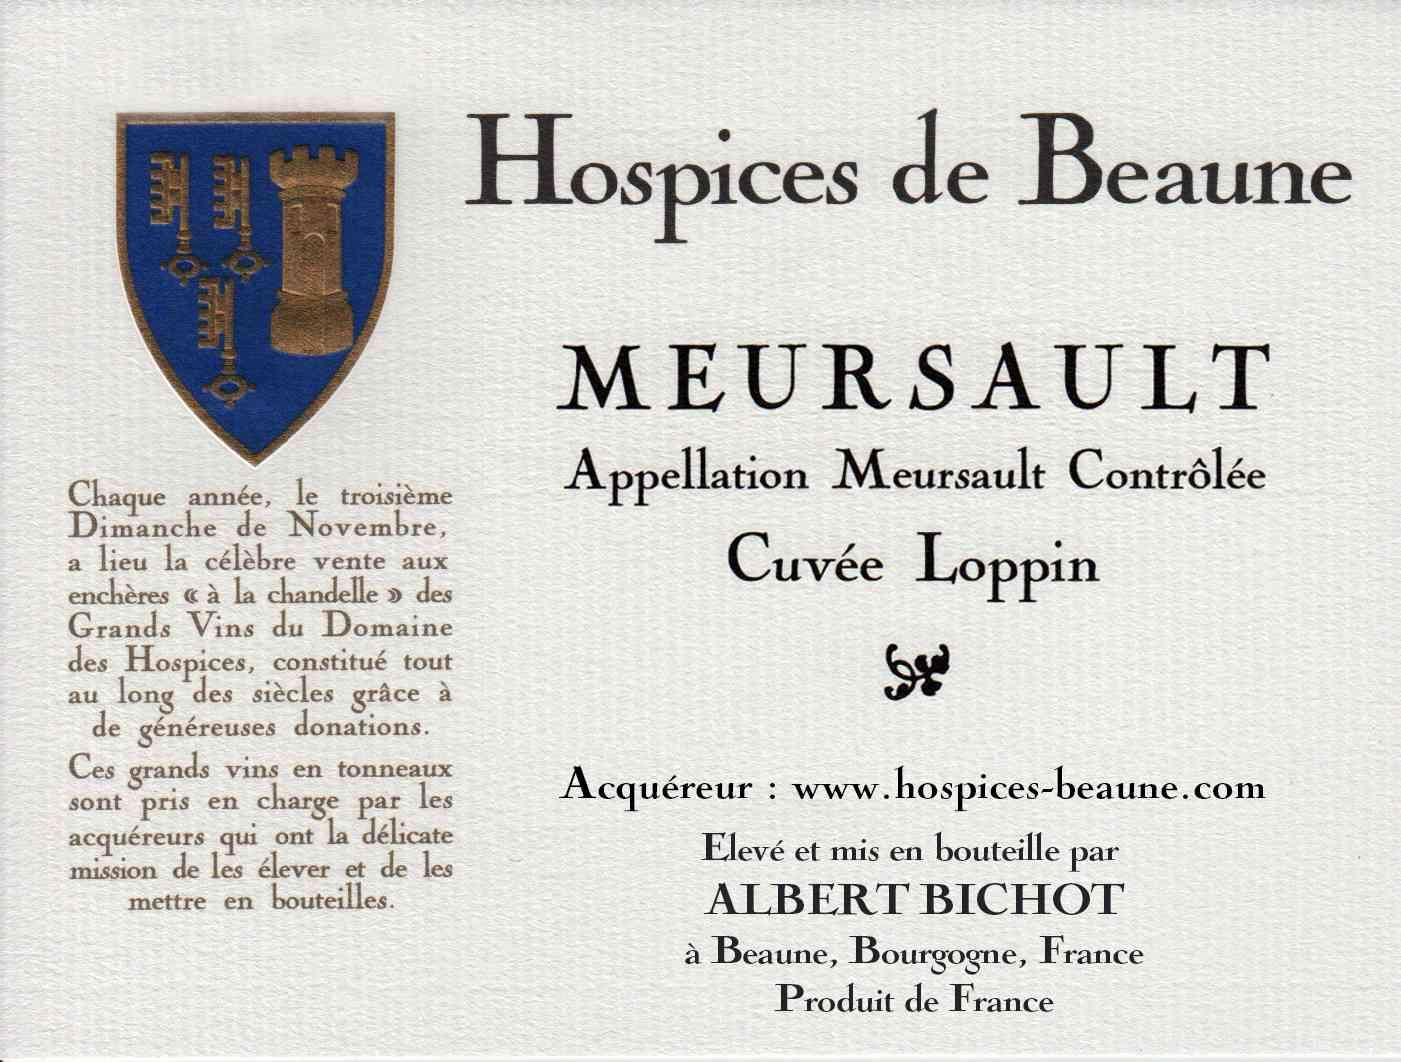 Encheres-auction-HospicesdeBeaune-AlbertBichot-Meursault-Cuvee-Loppin